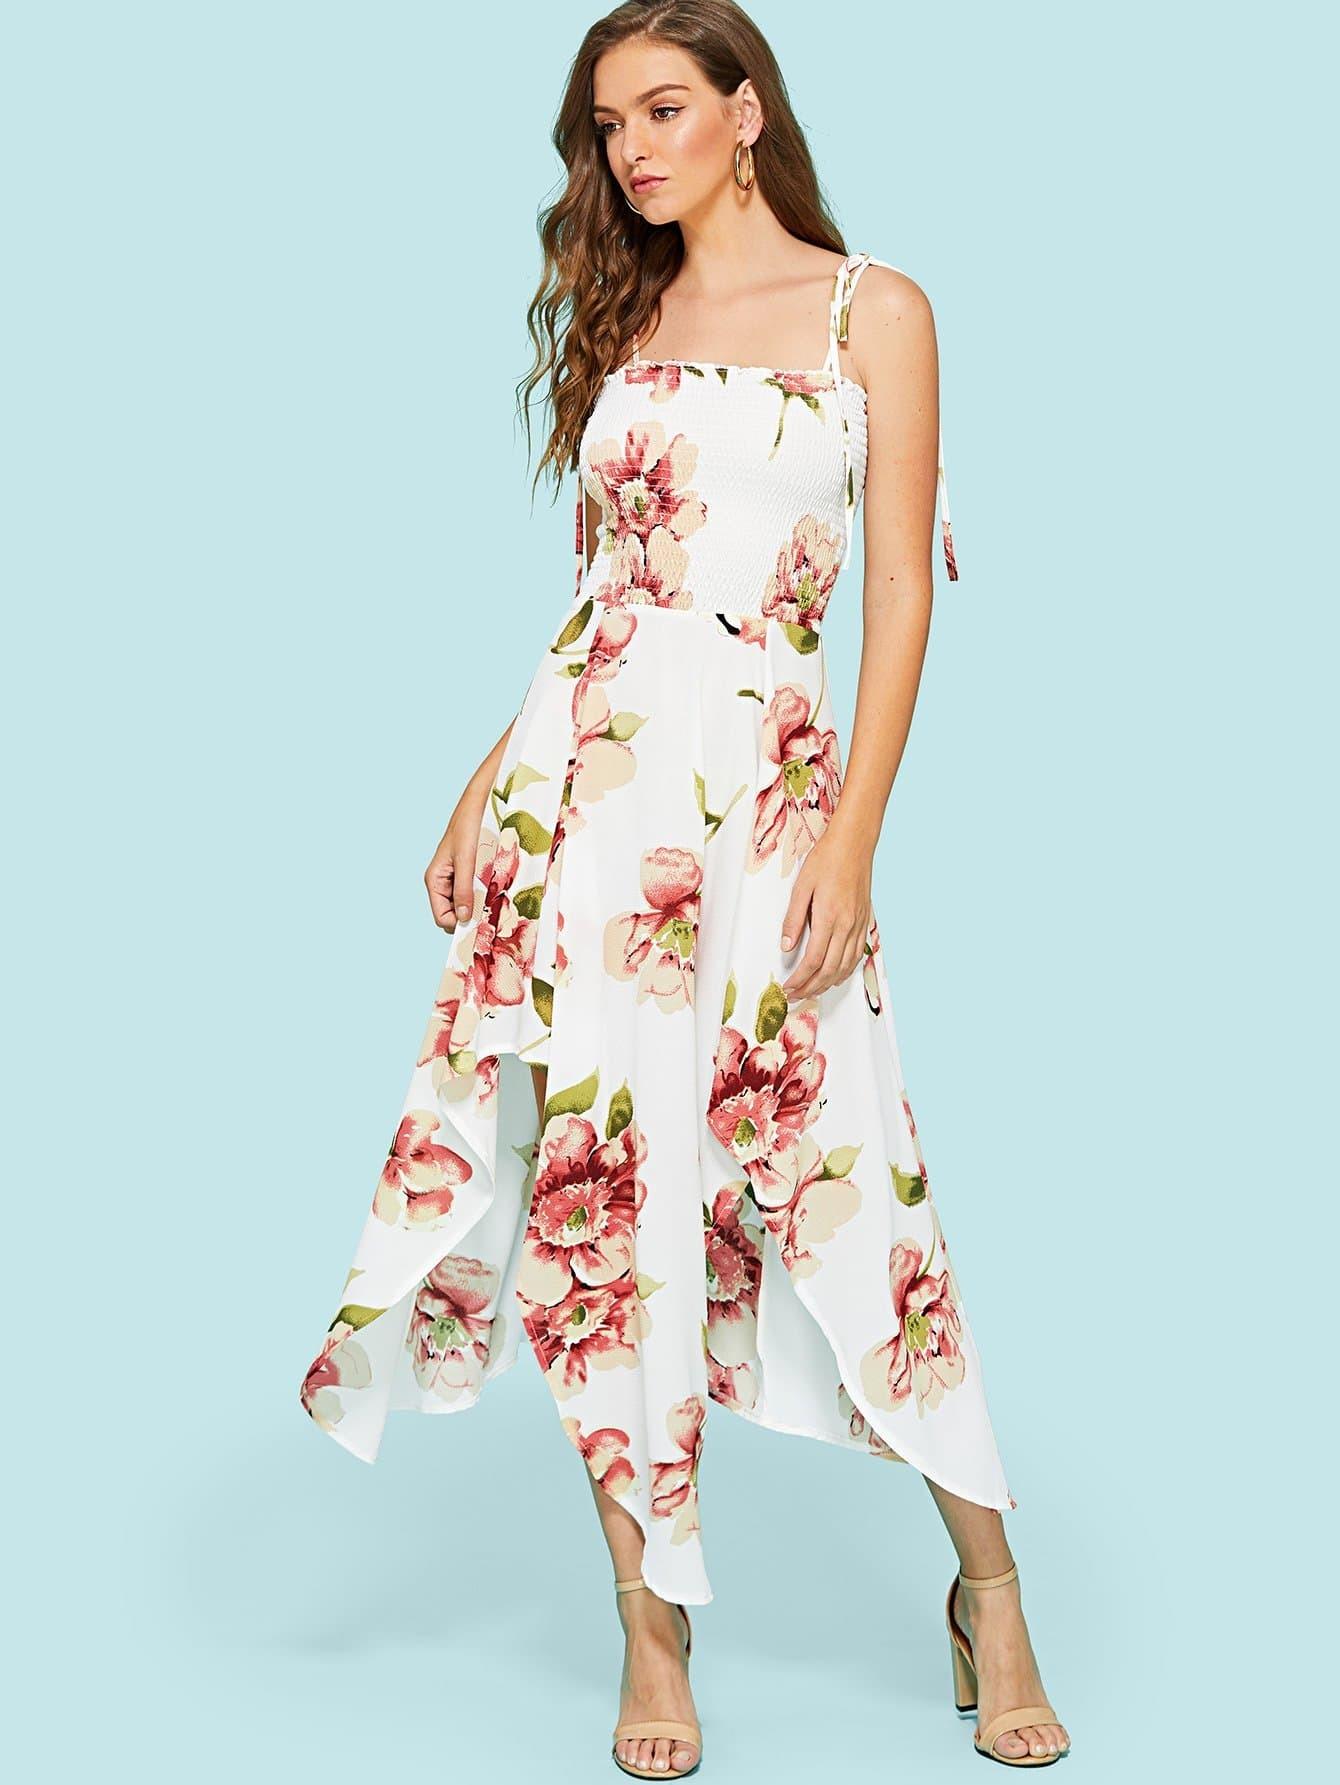 Floral Print Split Hem Cami Dress hanky hem floral print cami tank top